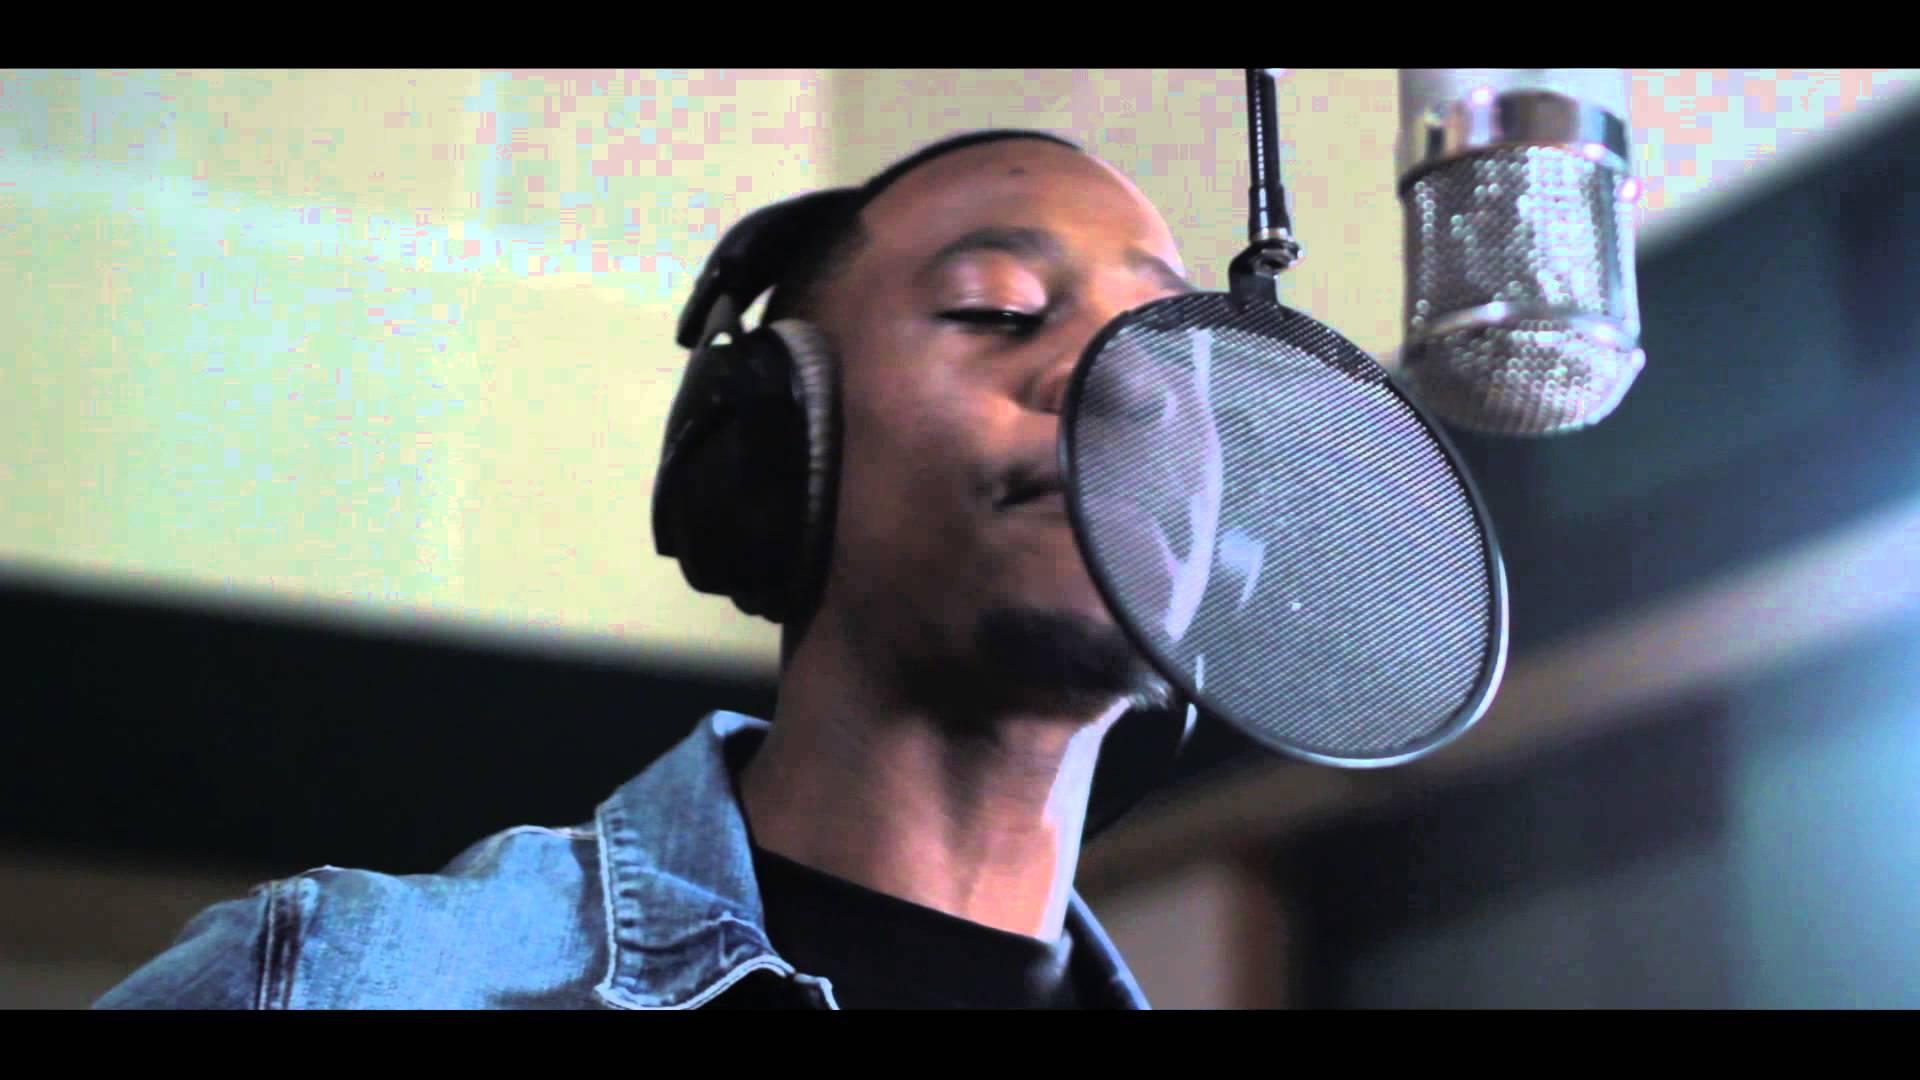 Dmo – A Musician's Ode